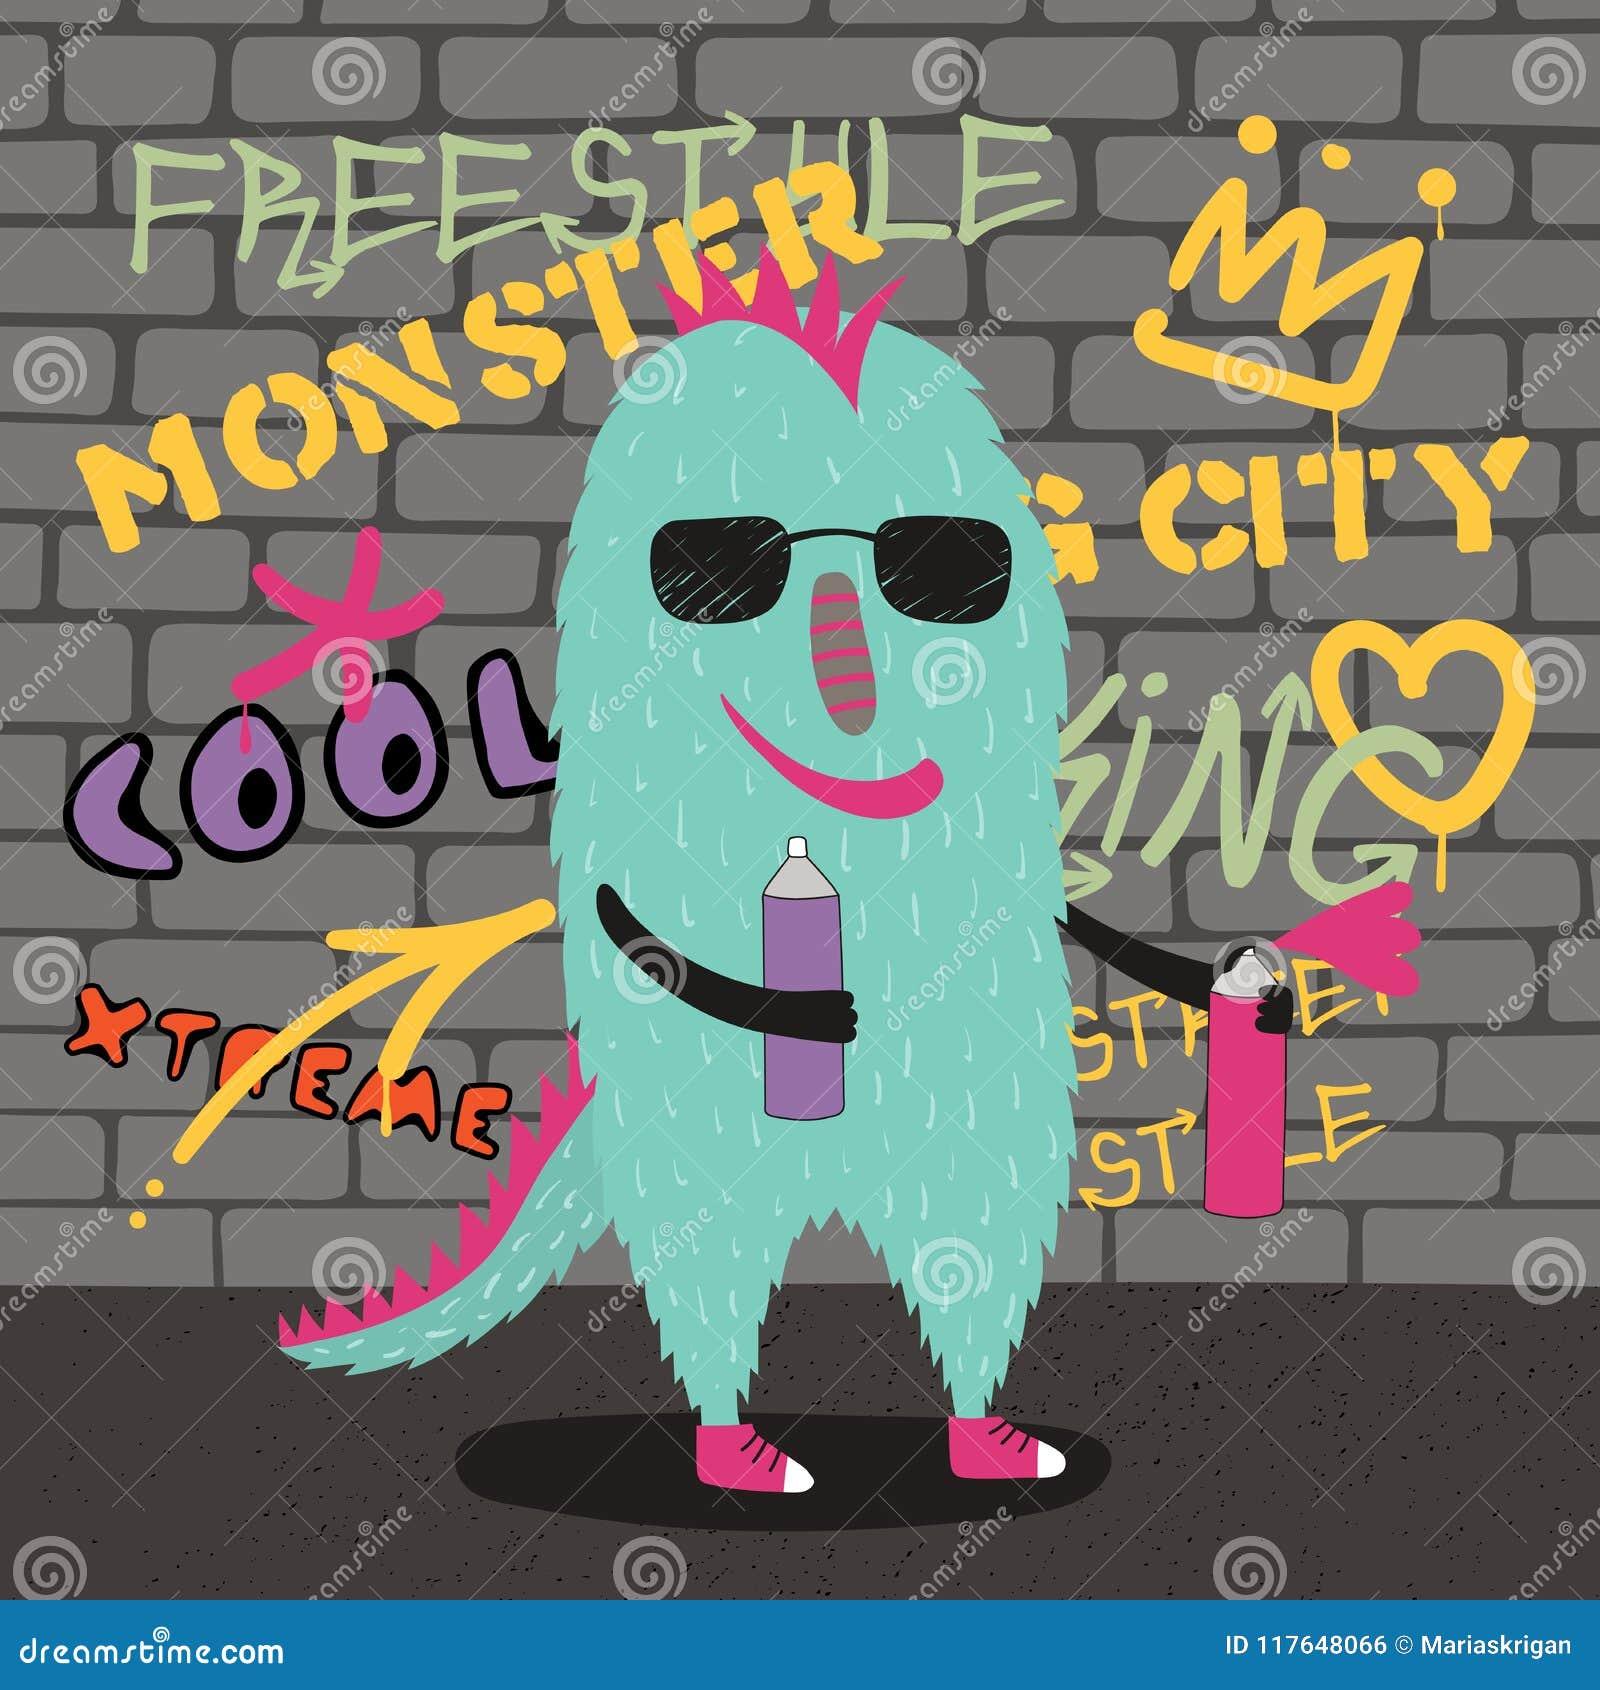 Cute street style monster stock vector illustration of graphic jpg 1300x1390 grafitti monster cute